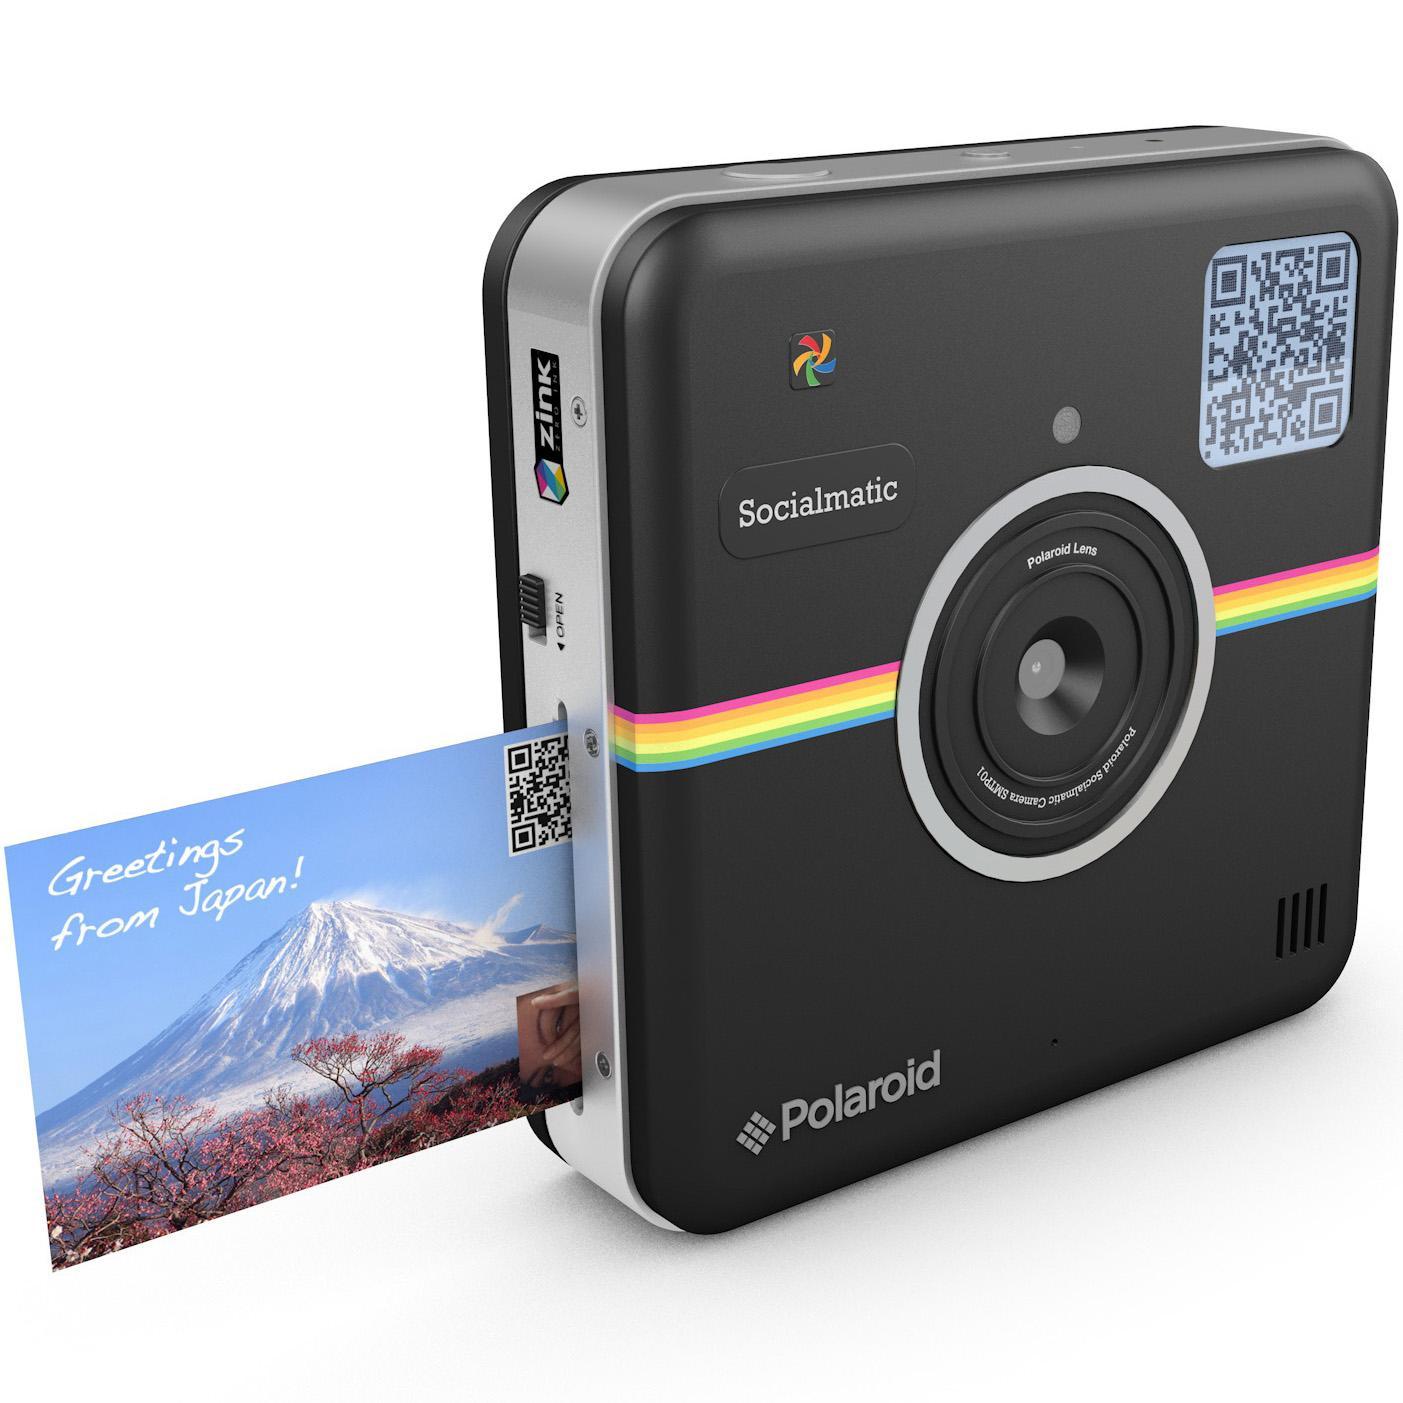 Amazon.com : Polaroid Socialmatic Instant Digital Camera (Black